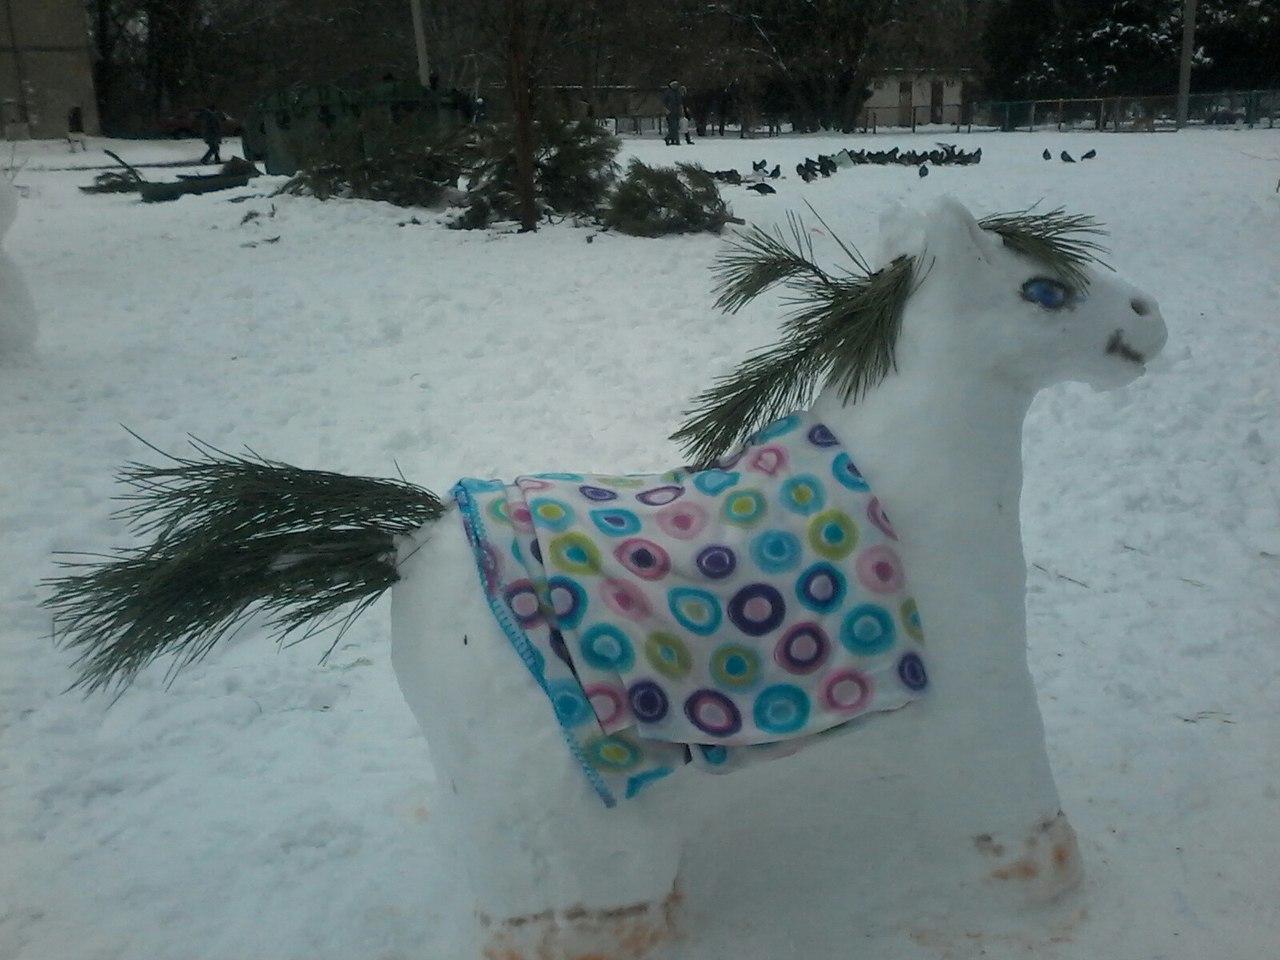 В Херсоне обнаружен снежный пони (фото)